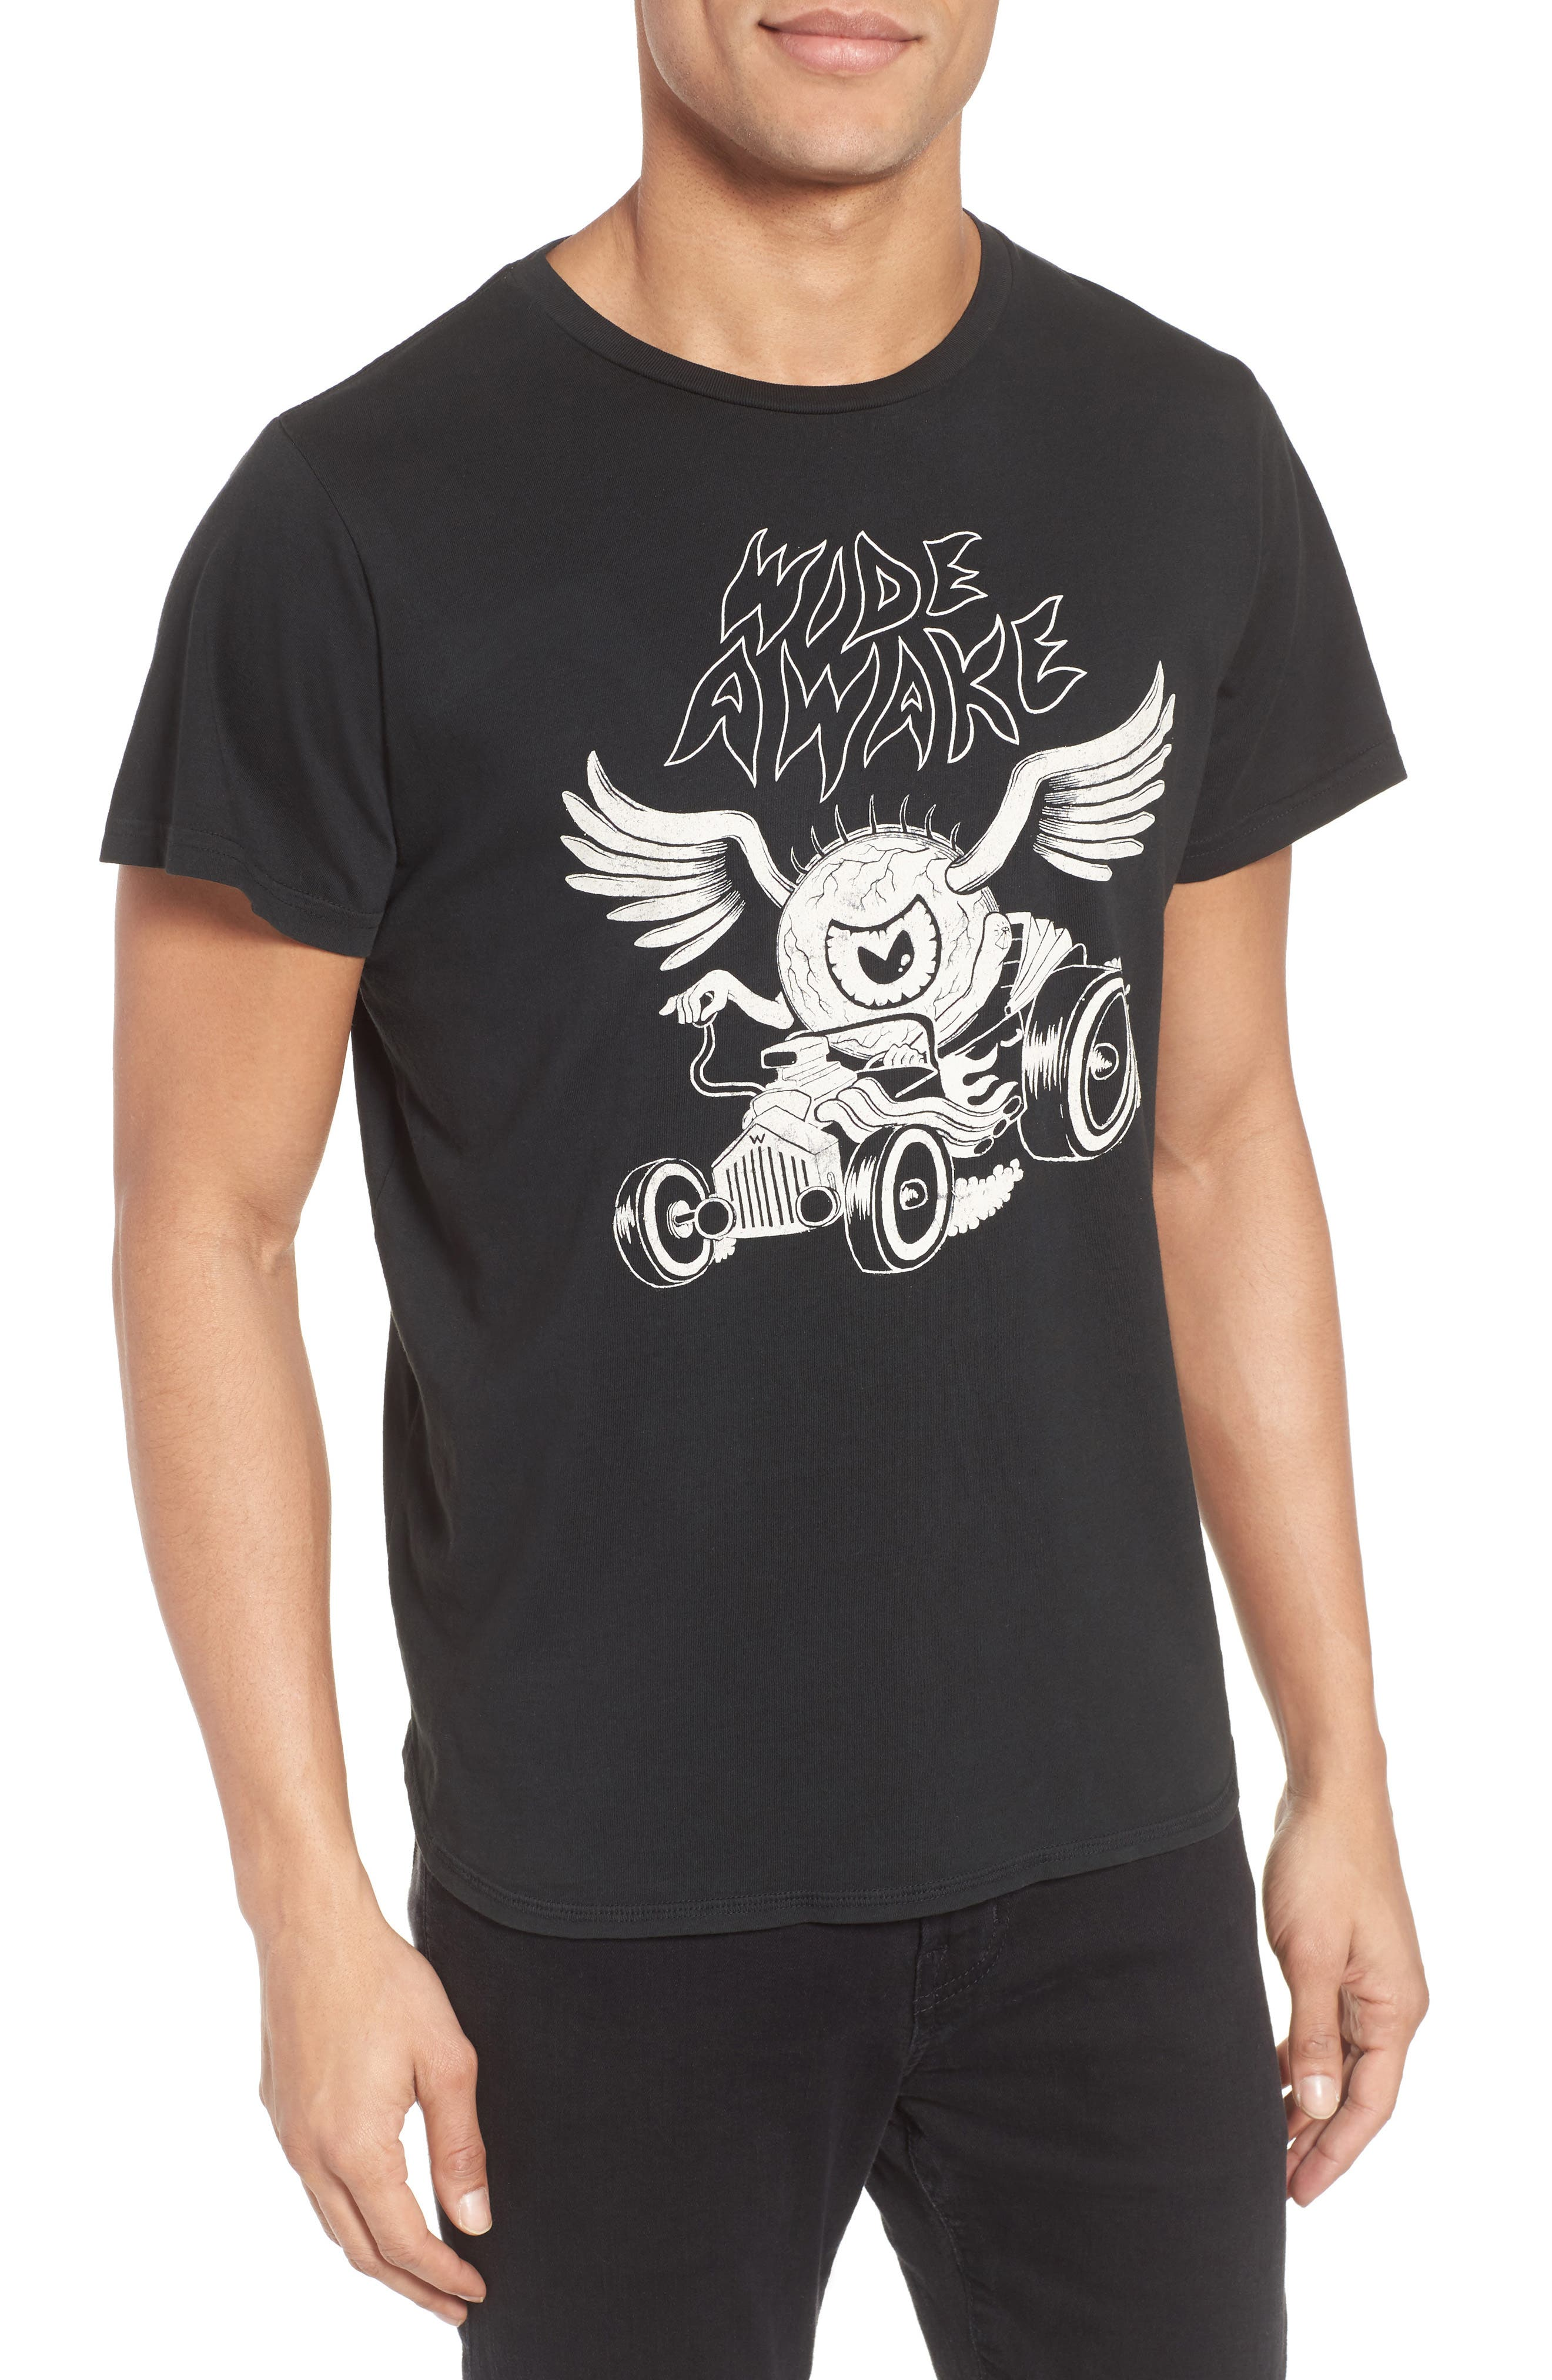 Wide Awake Graphic T-Shirt,                             Main thumbnail 1, color,                             Dusty Black